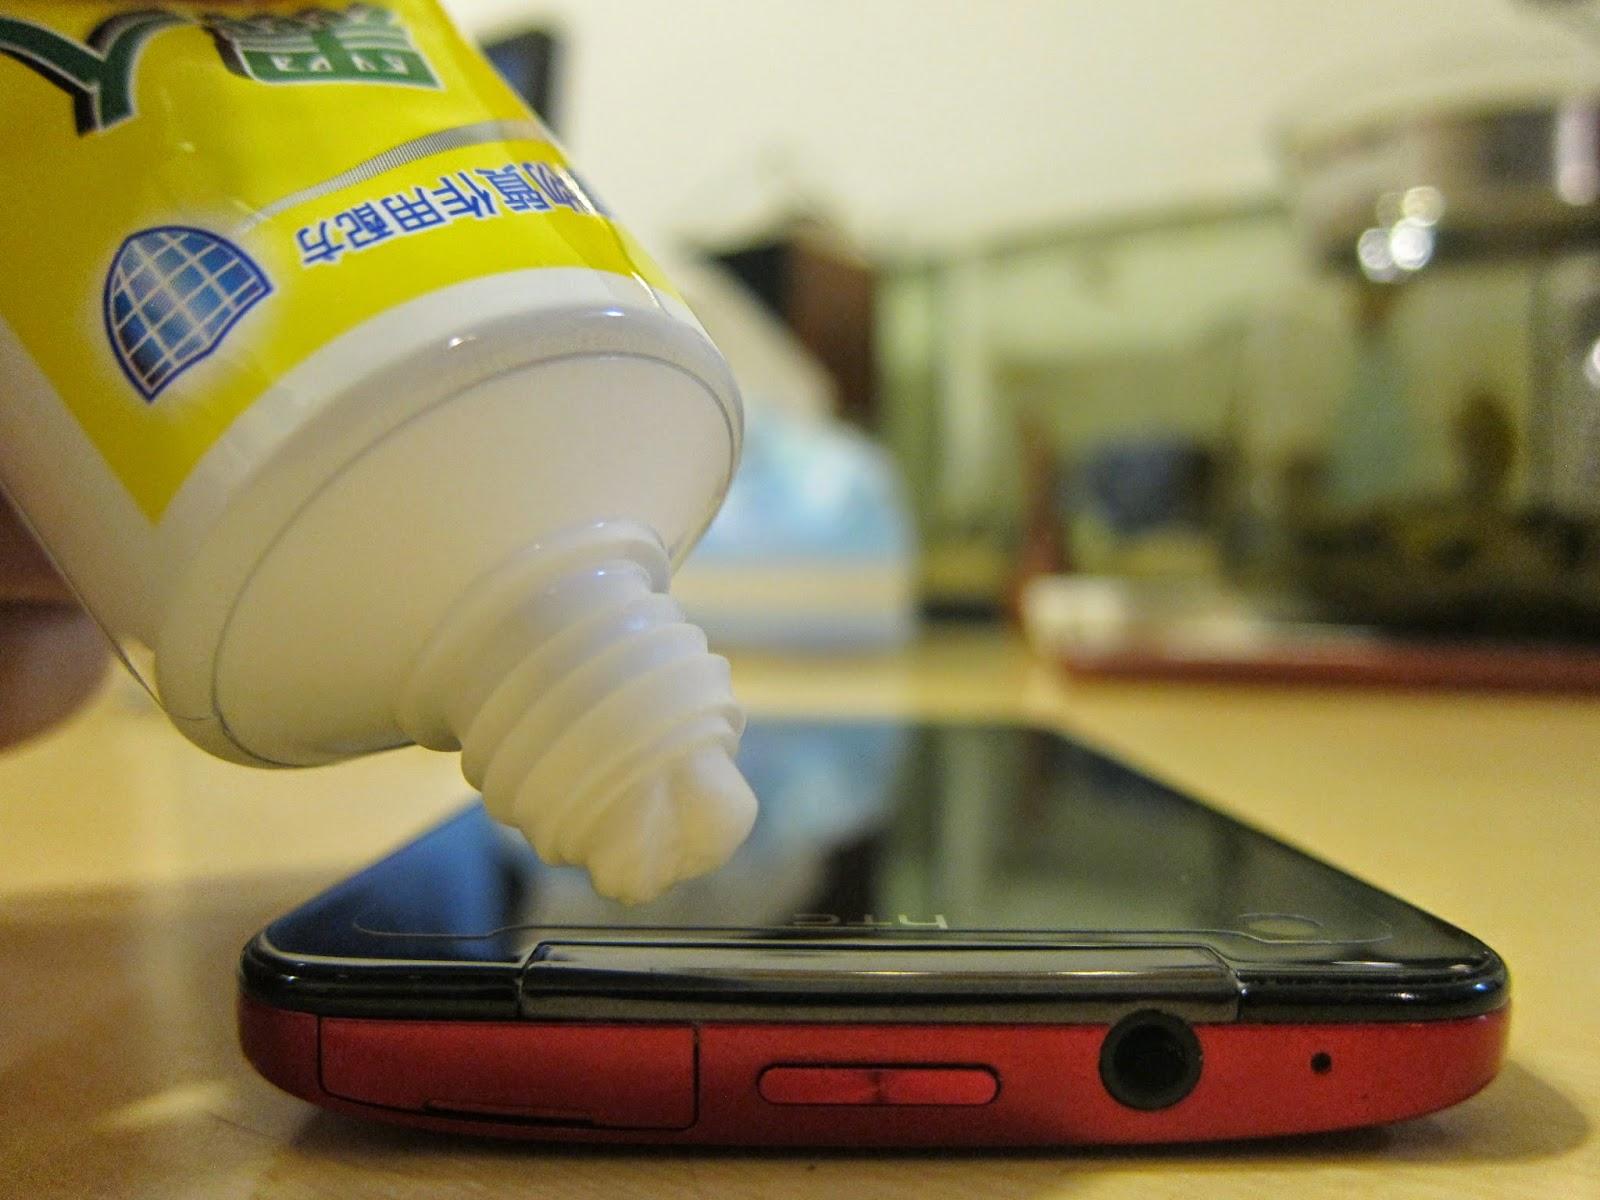 IMG 2376 - [實驗] 手機刮傷、痕跡,抹牙膏真的有效嗎?